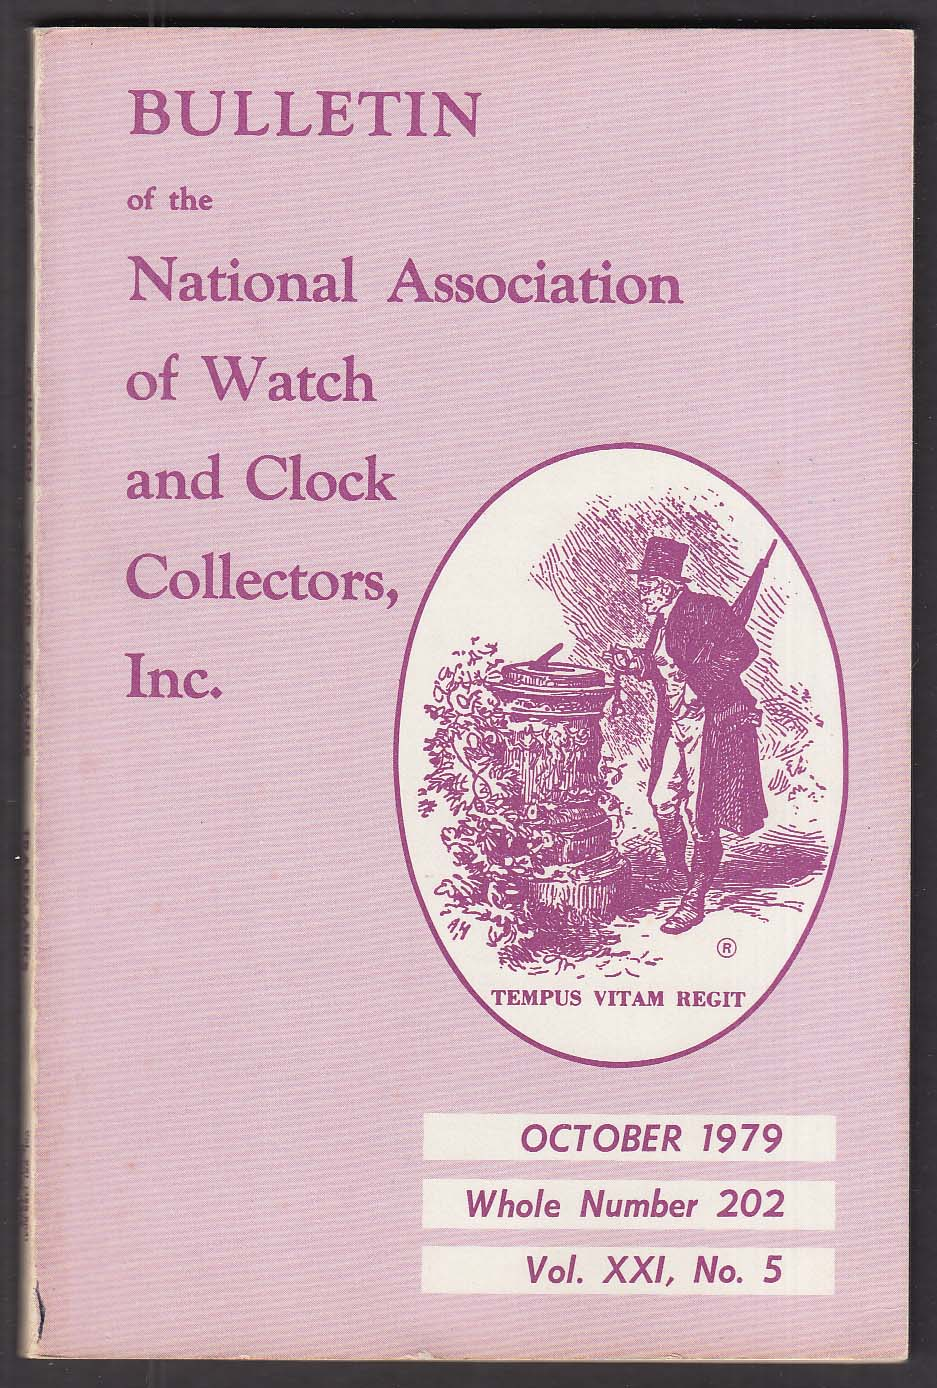 NAWCC Bulletin #202 Crow, Terry, Water Clock ++ 10 1979